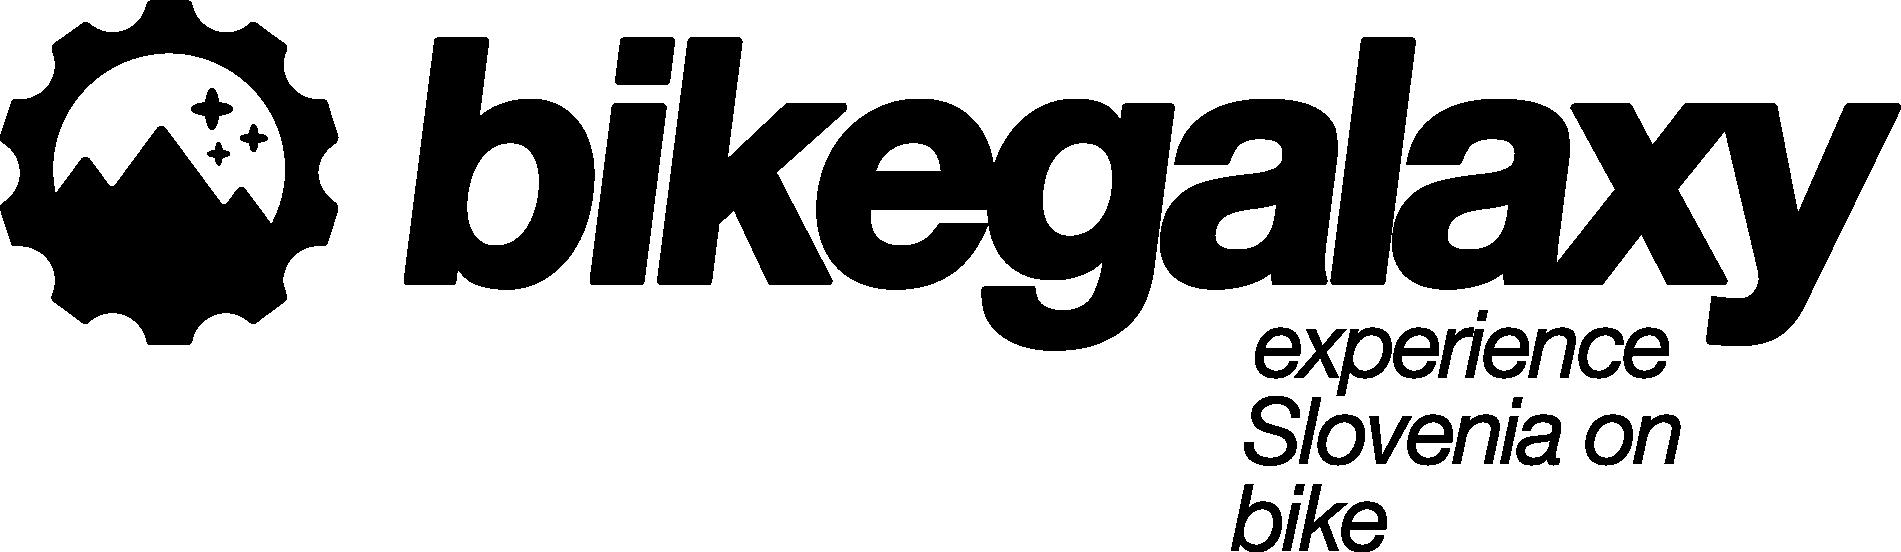 logo_crna